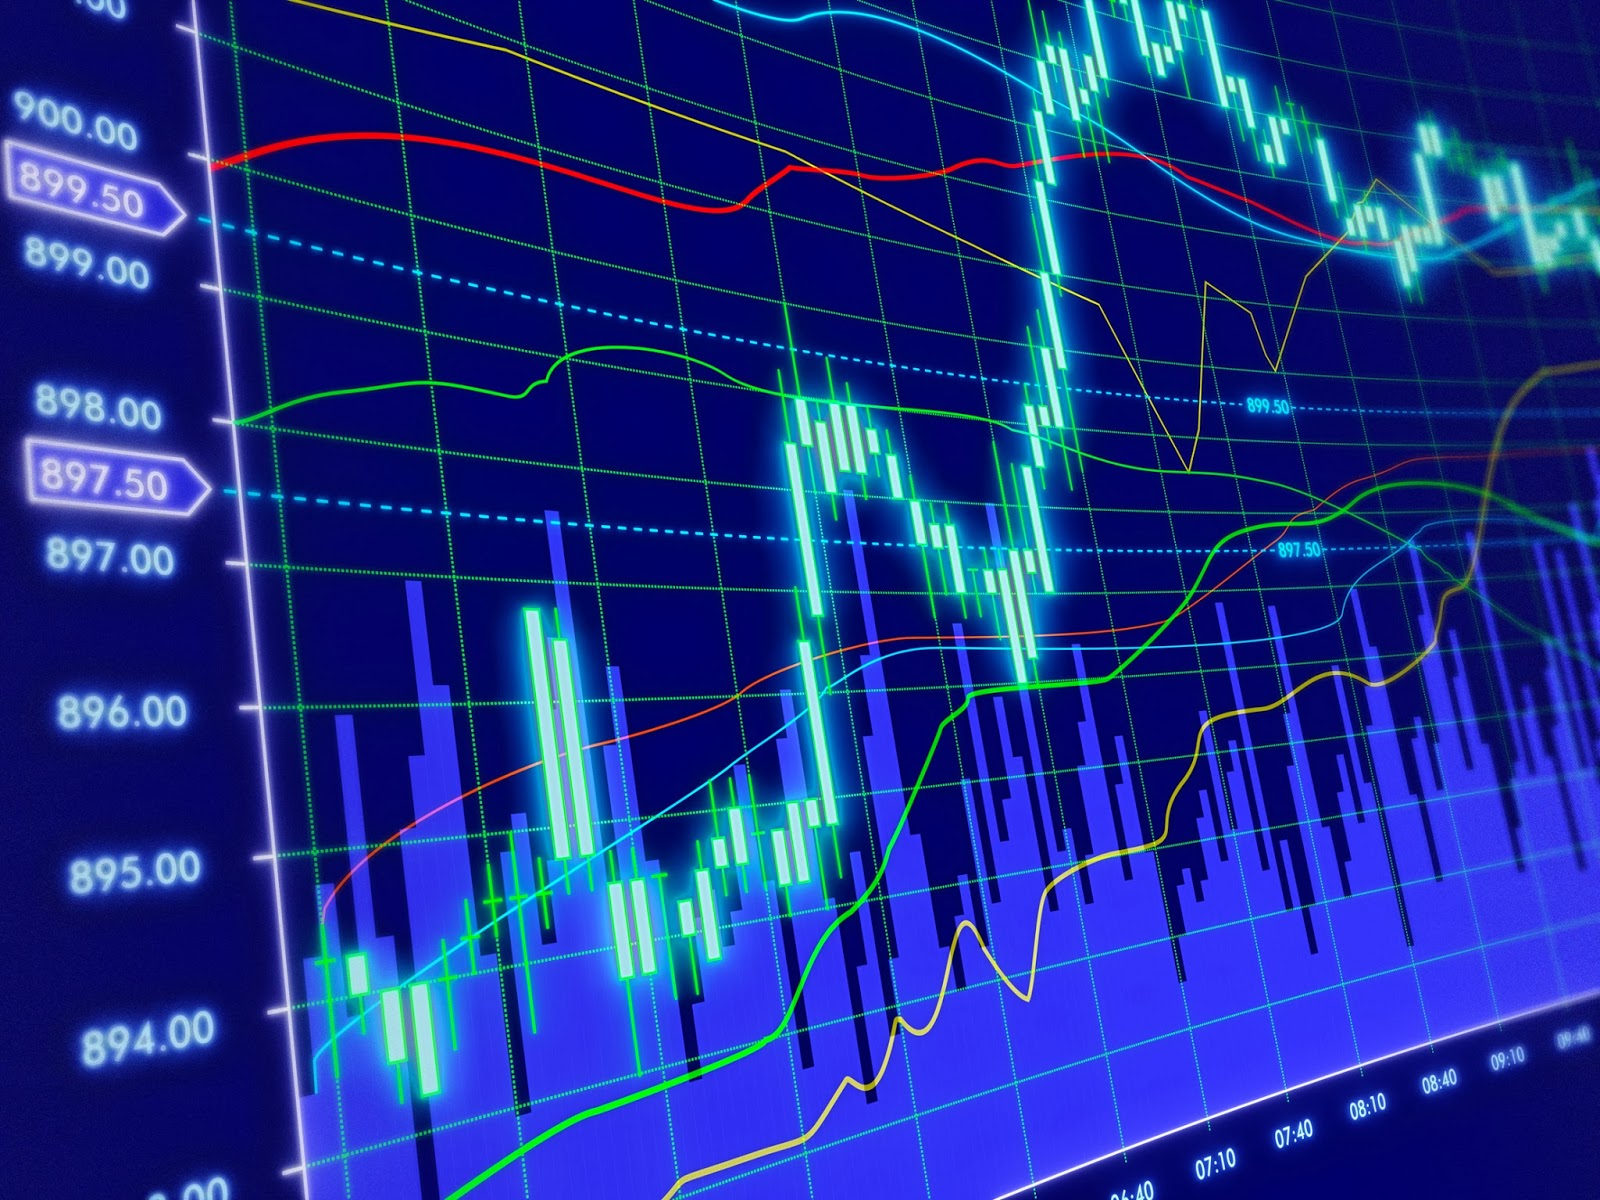 Gets global exchange trading system